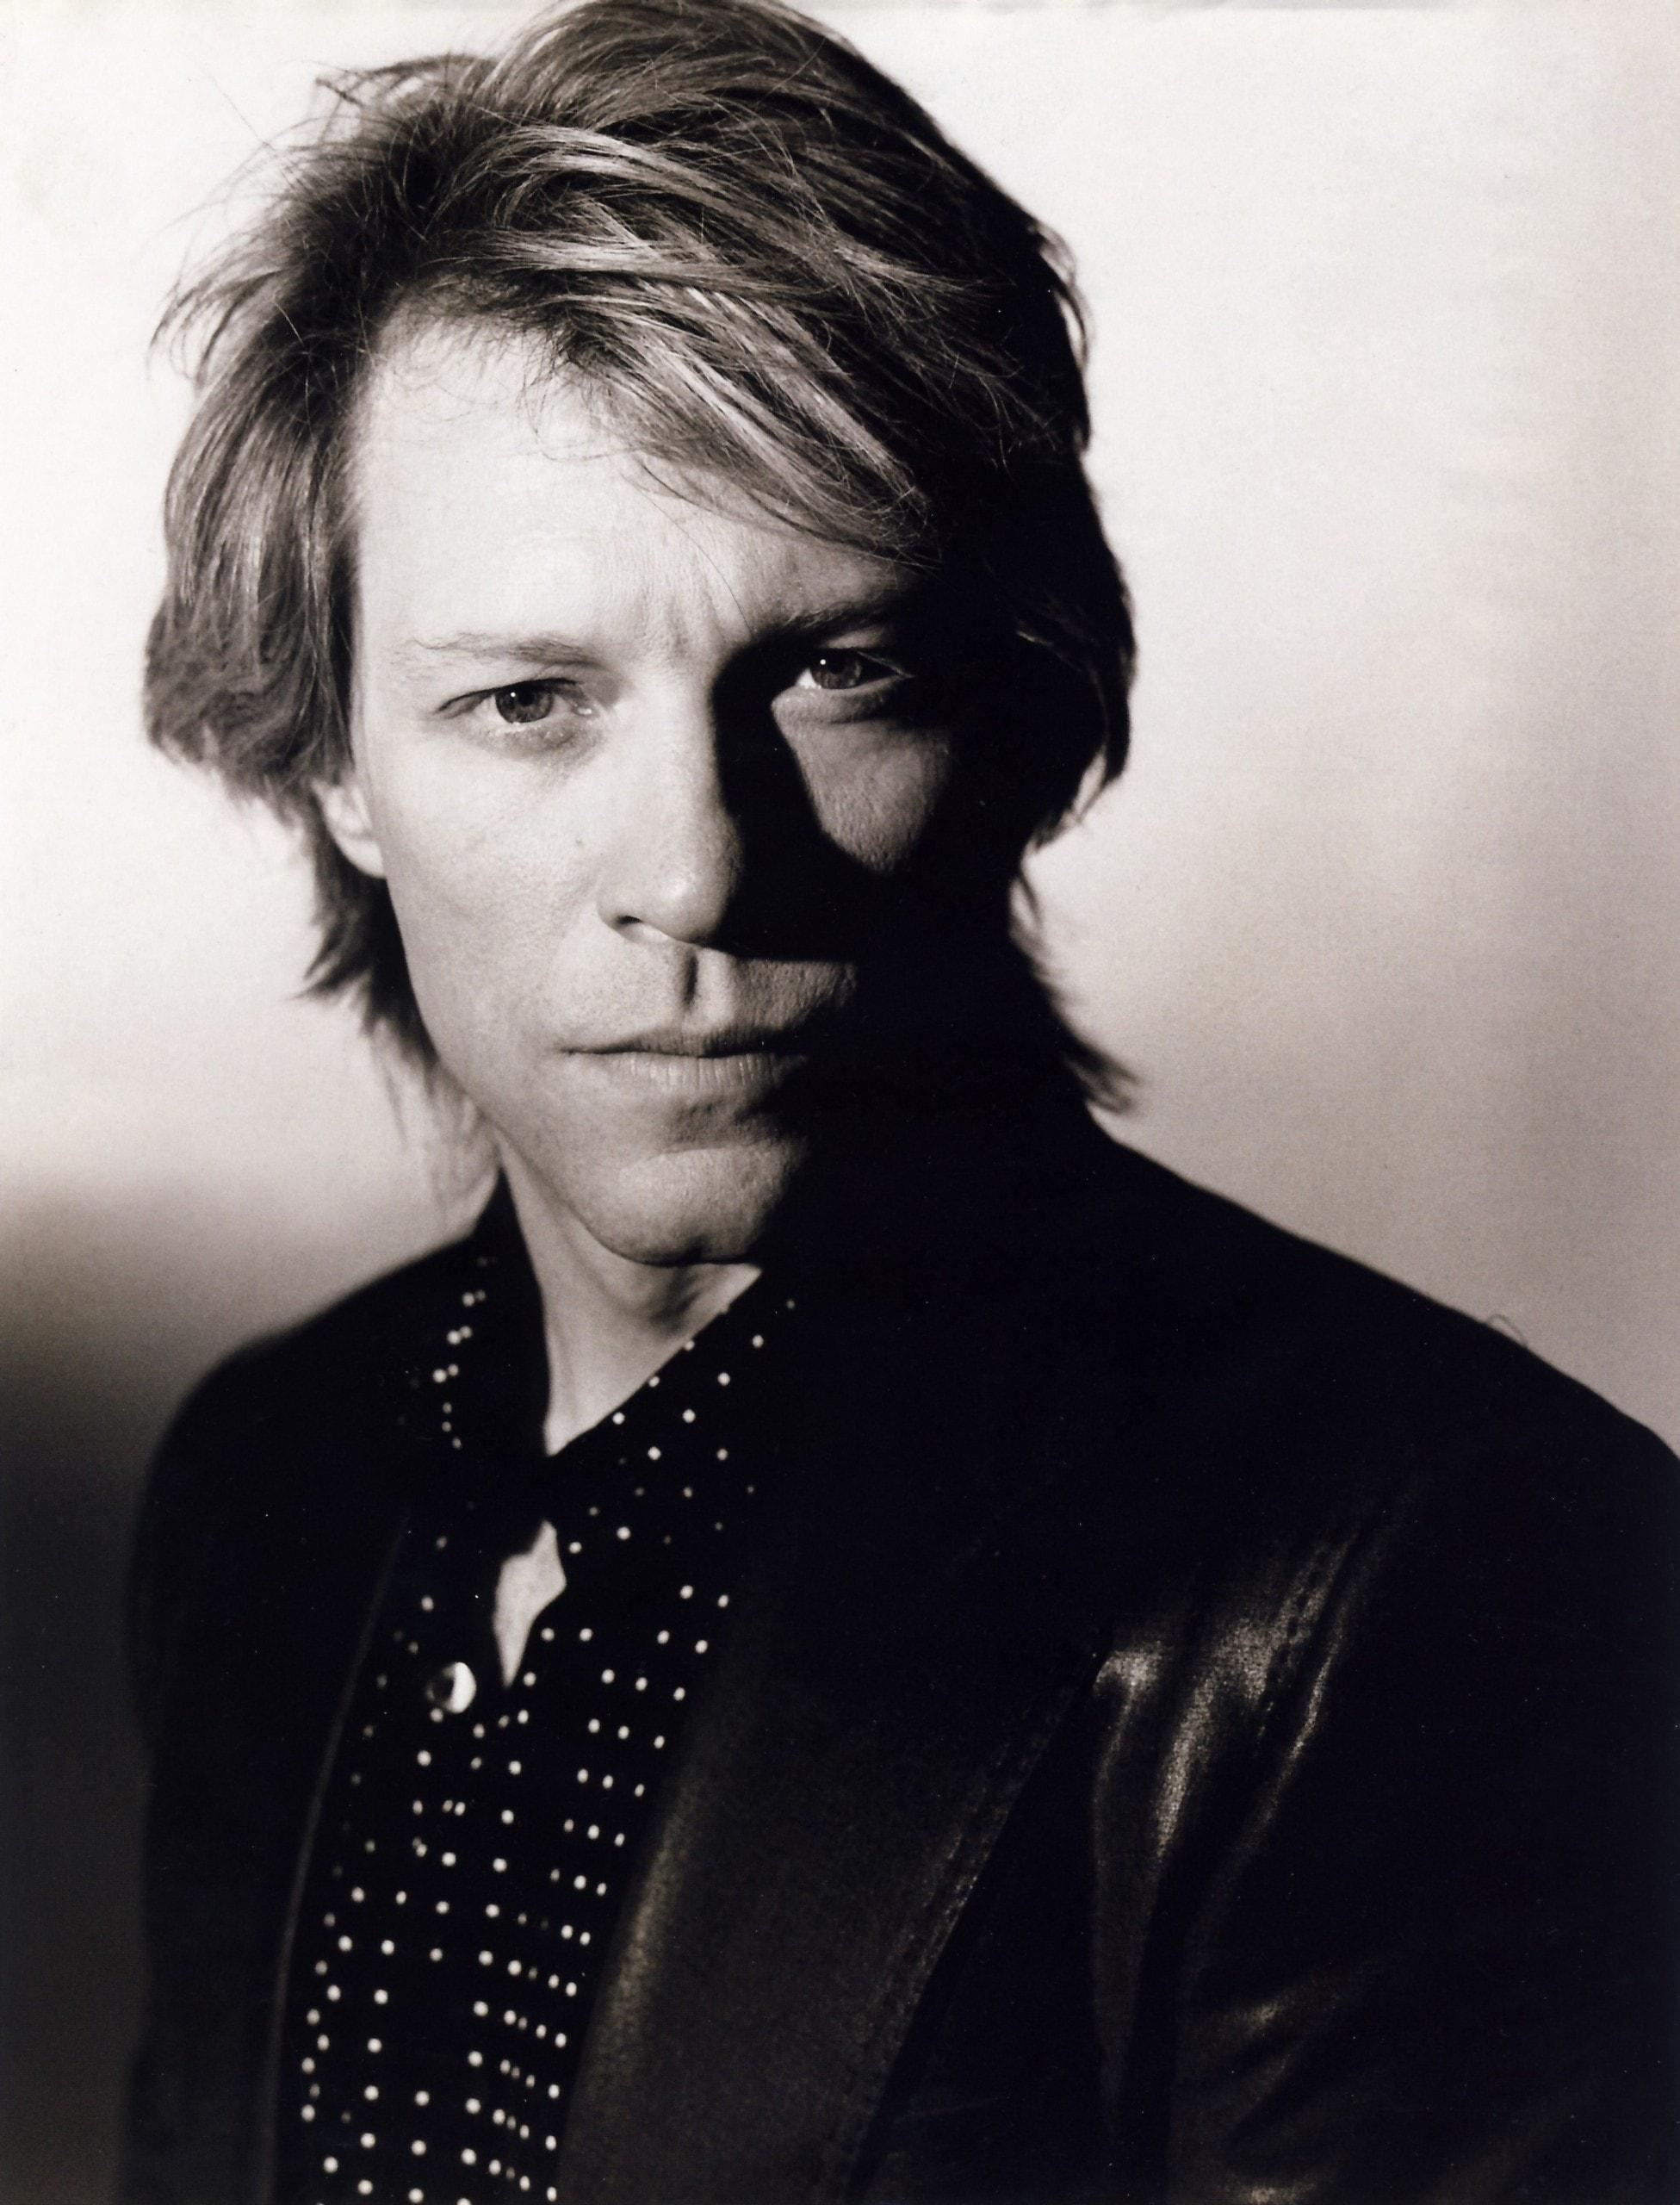 Jon Bon Jovi widescreen for desktop